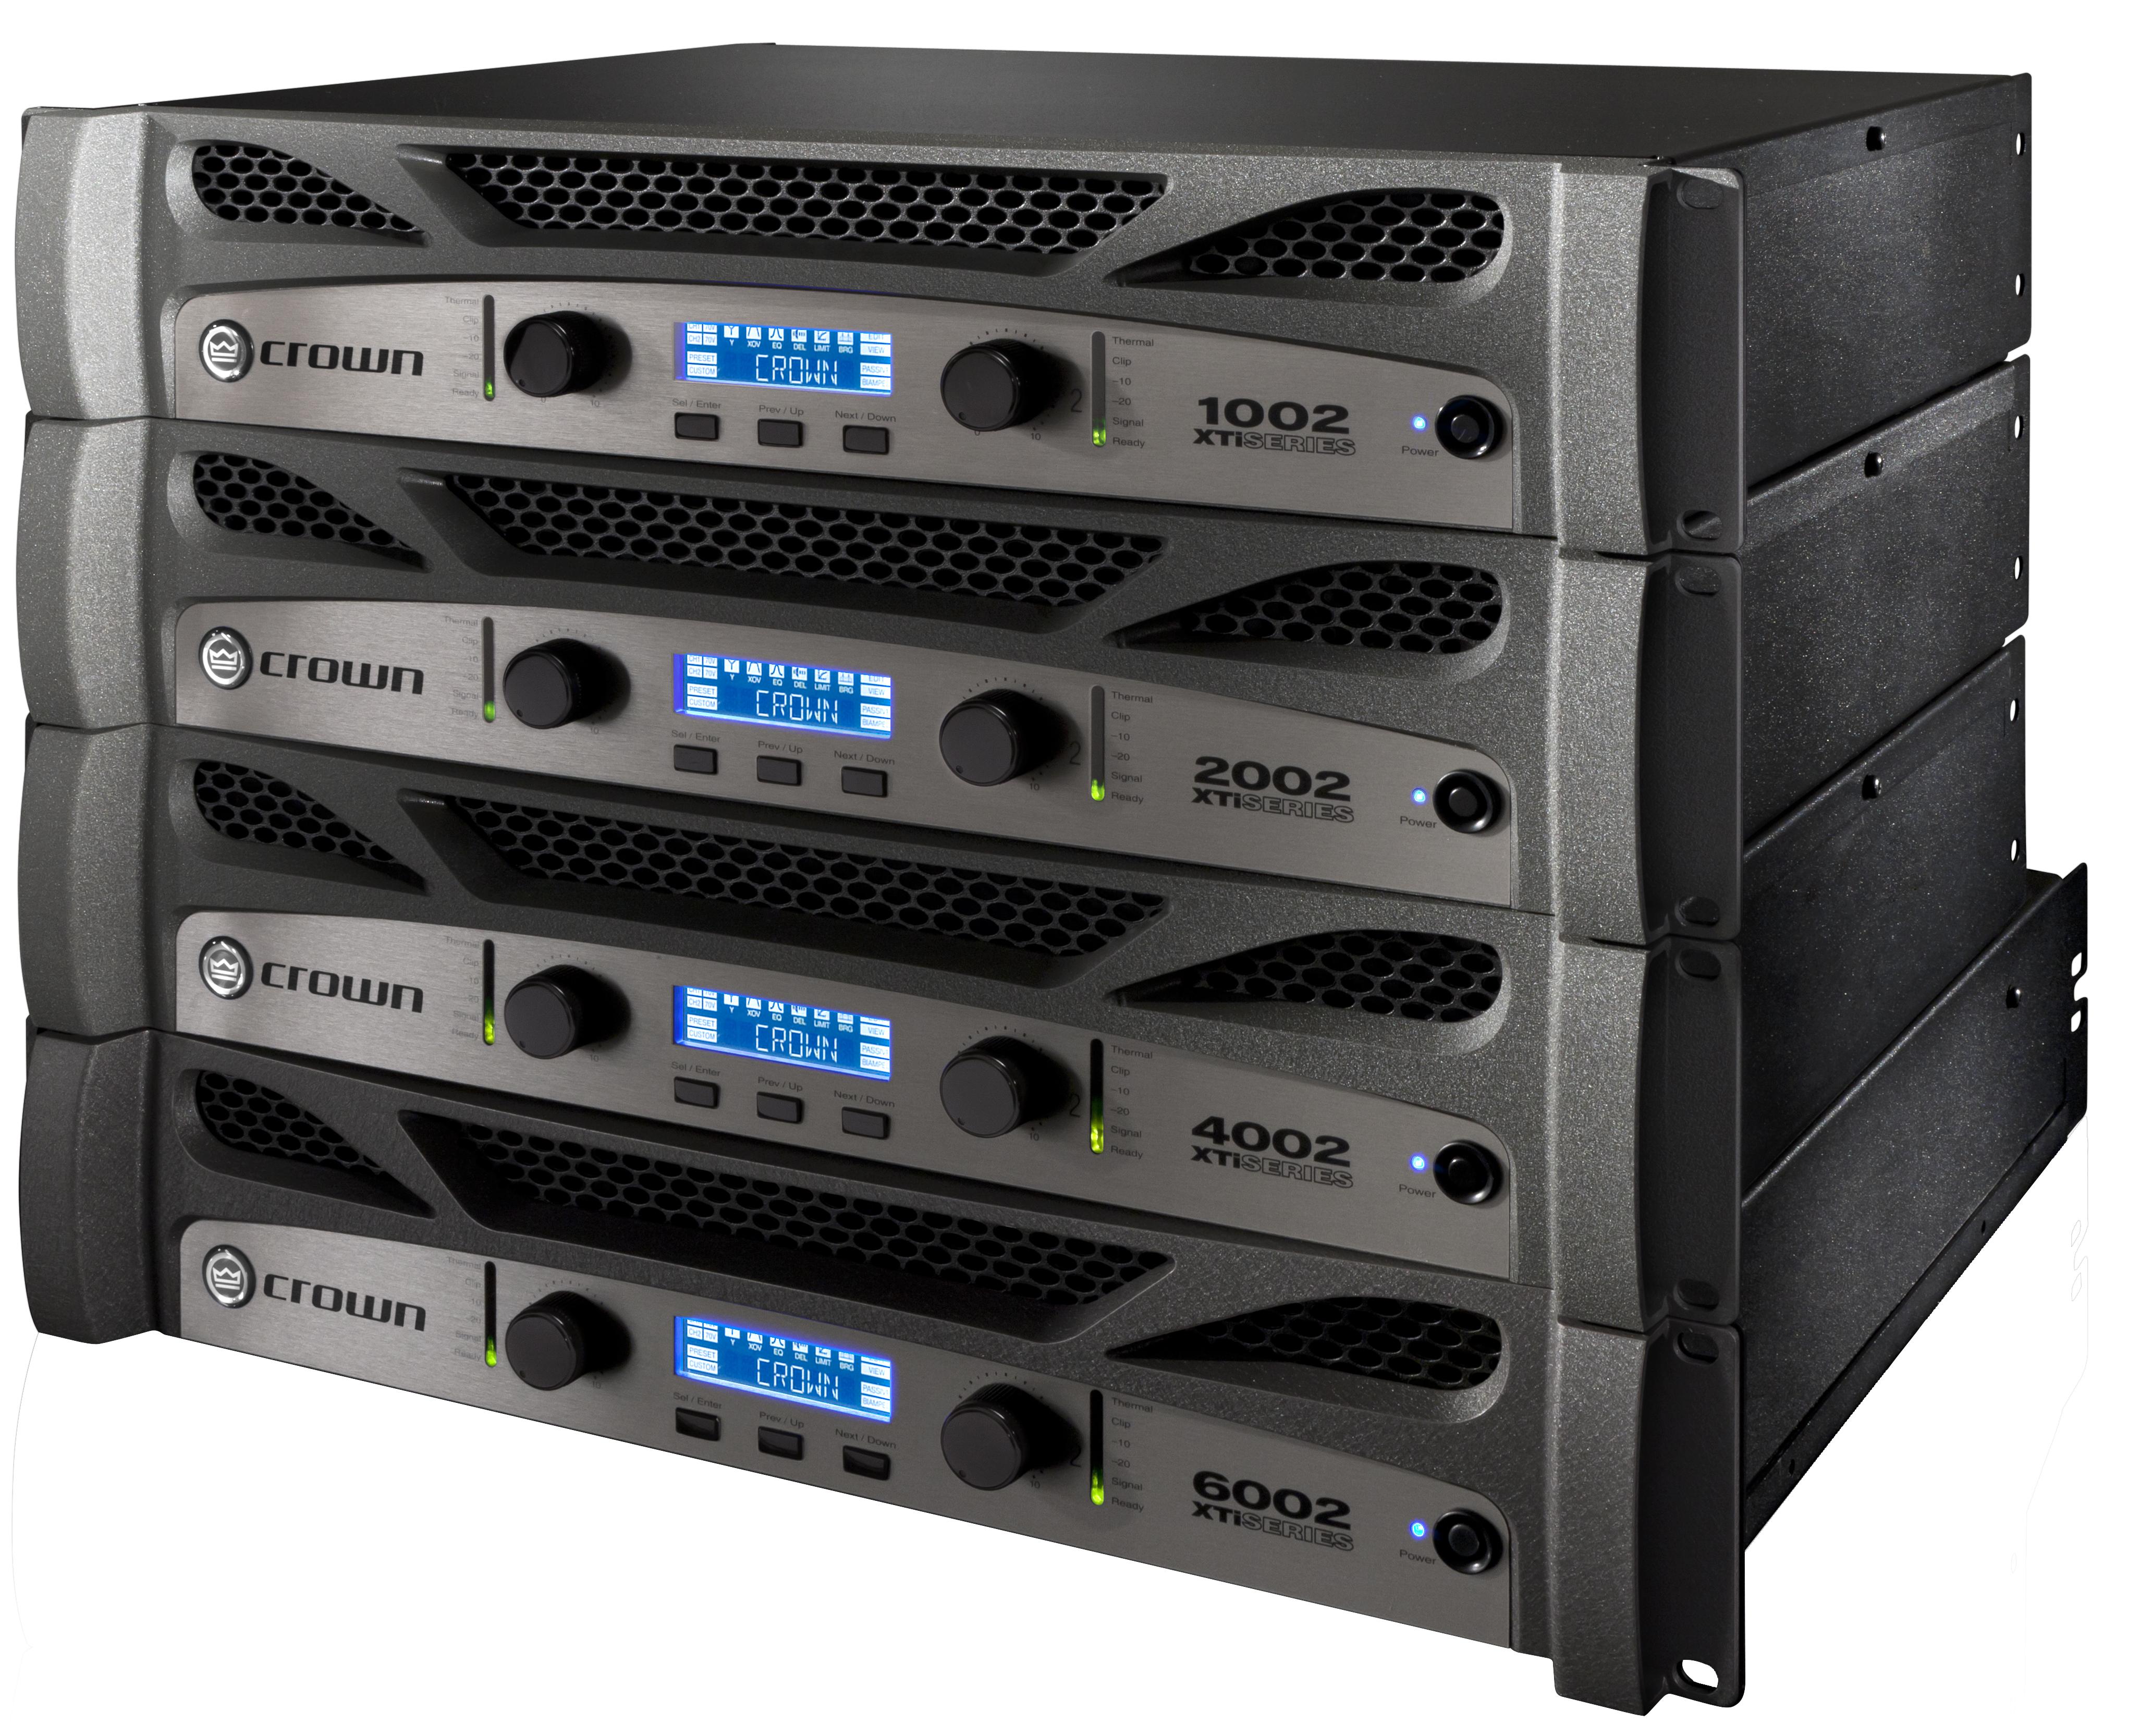 Pro Audio Power Amplifiers Buying Guide 300 Watt Subwoofer Amplifier